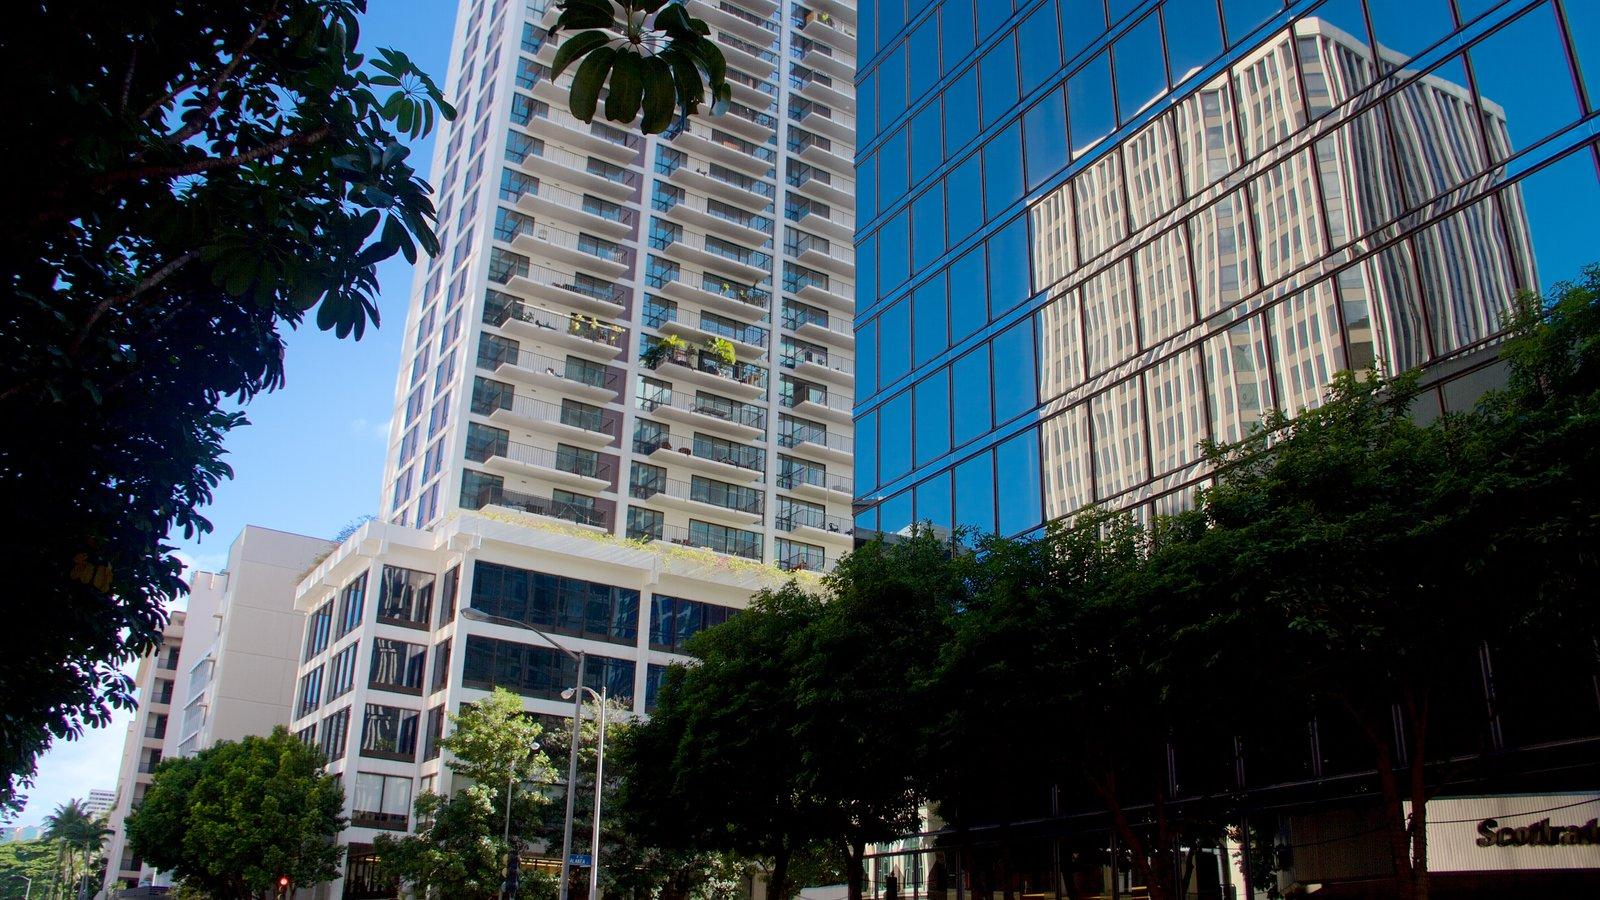 Honolulu mostrando arquitetura moderna